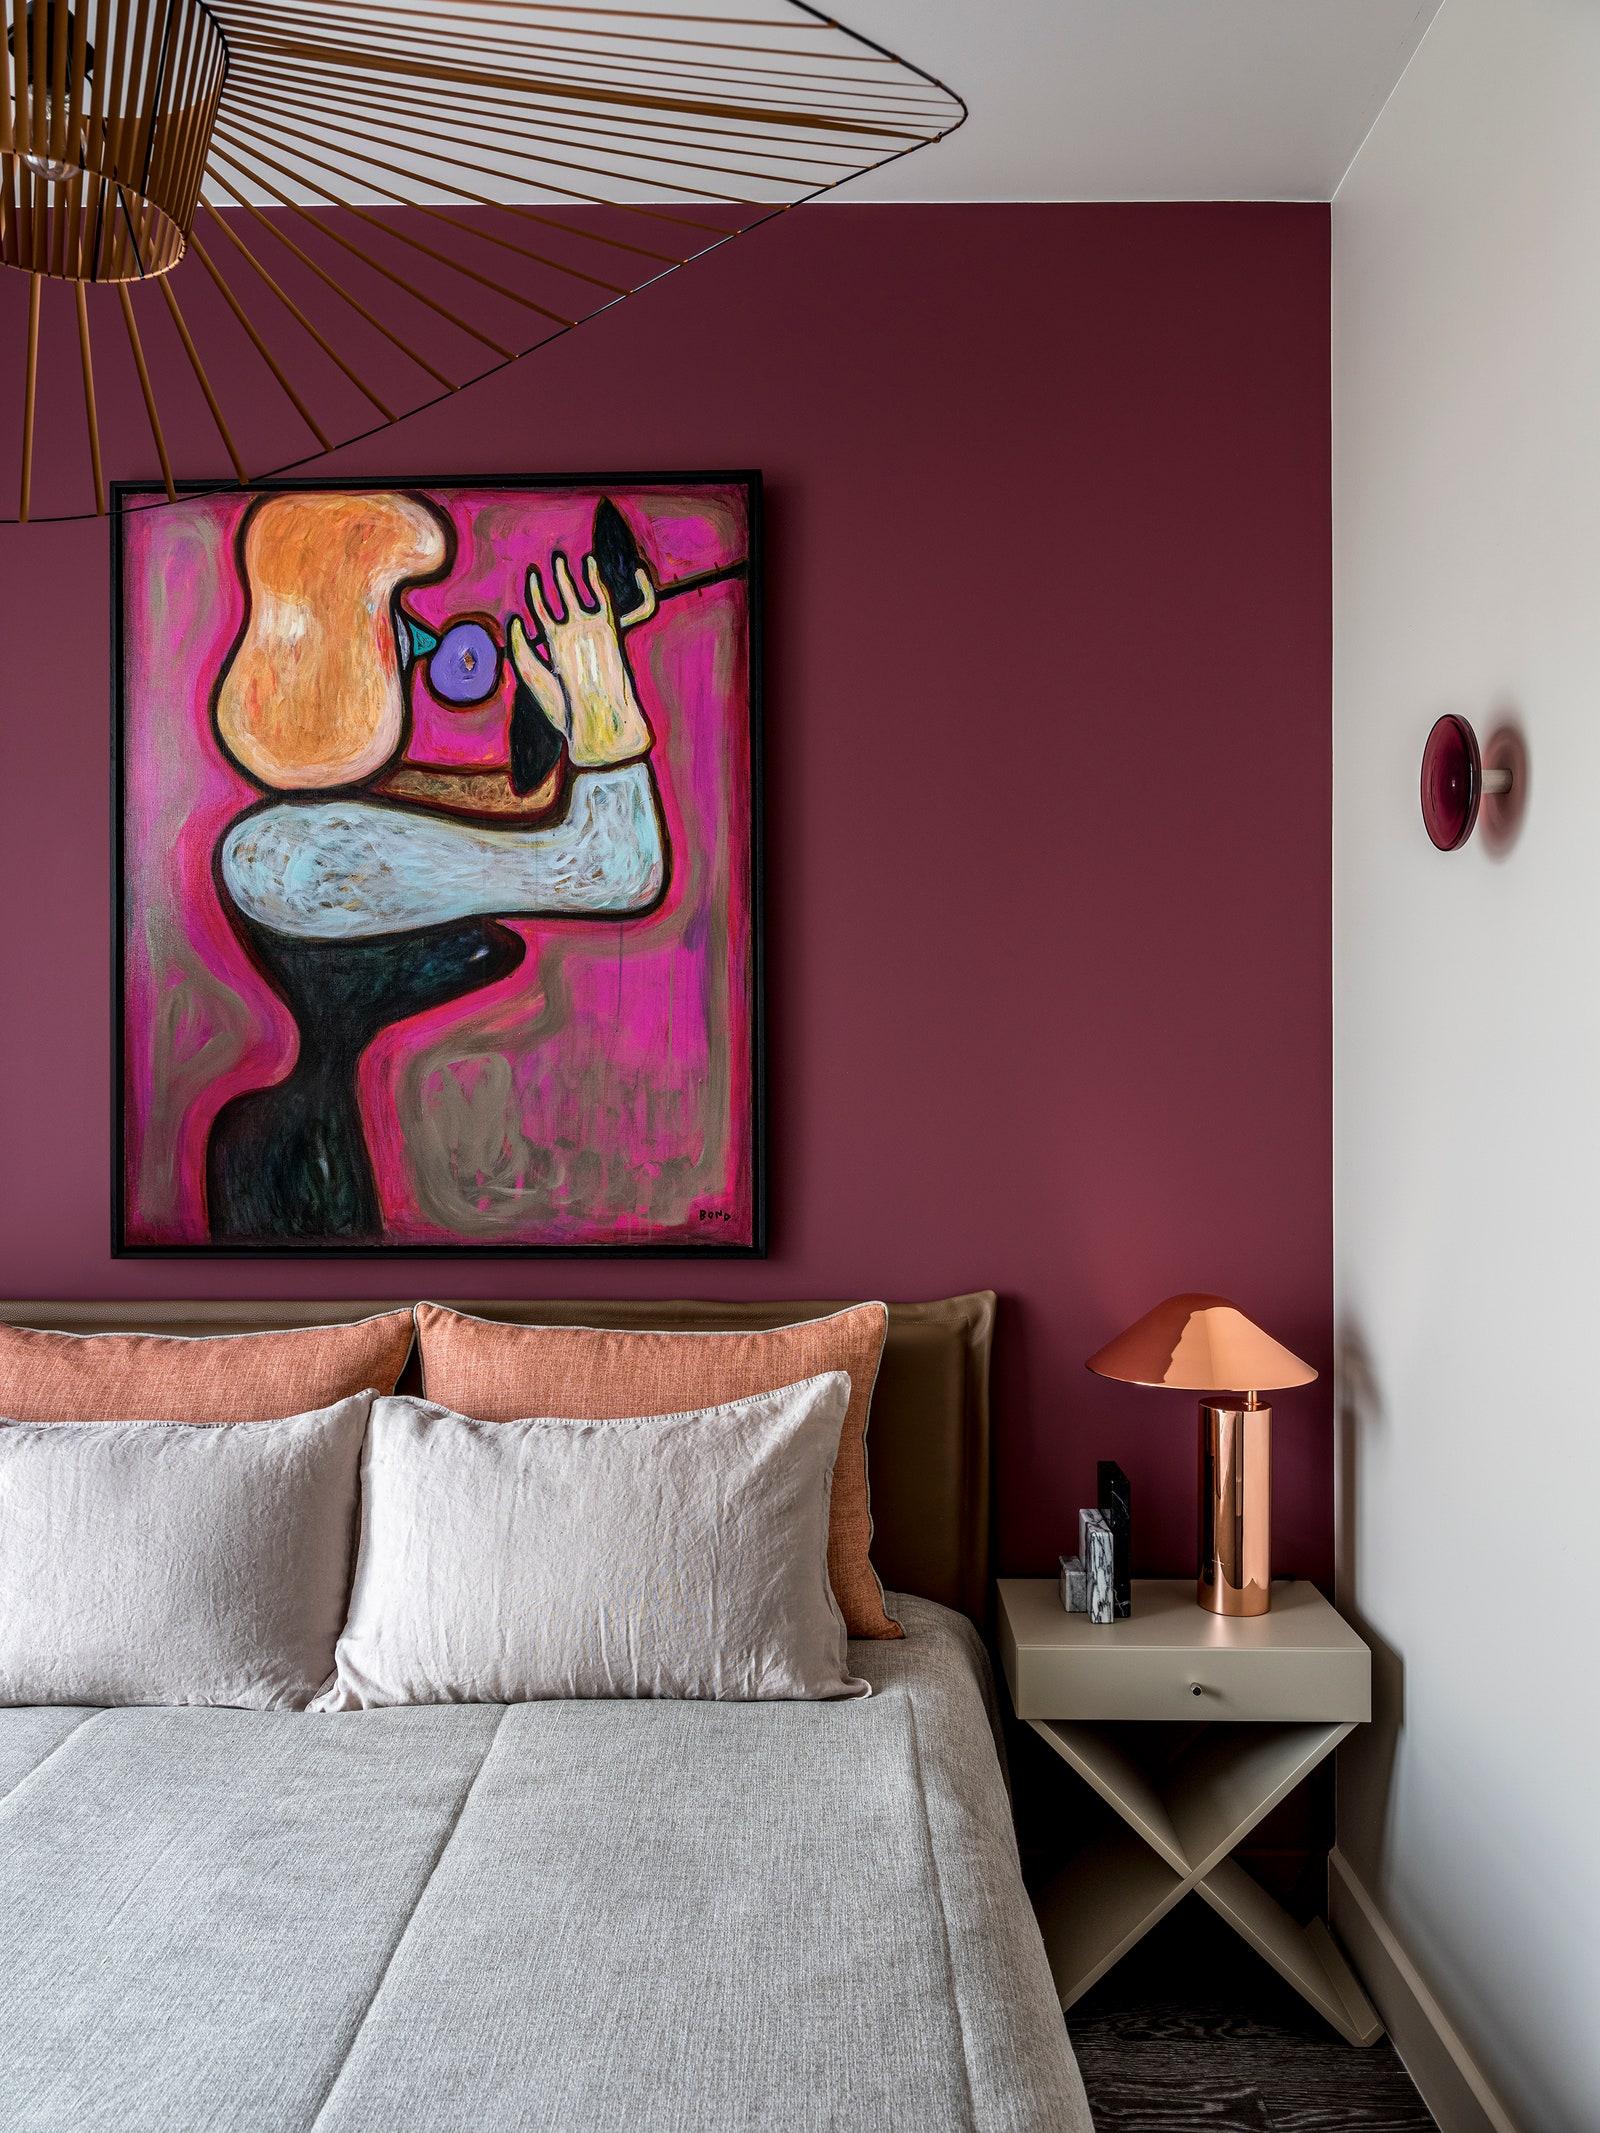 .         Vitset.  Bragin Design   Petite Friture   Aromas     Bookend Sculpture Kristina Dam        Schonbuch  Lilac...